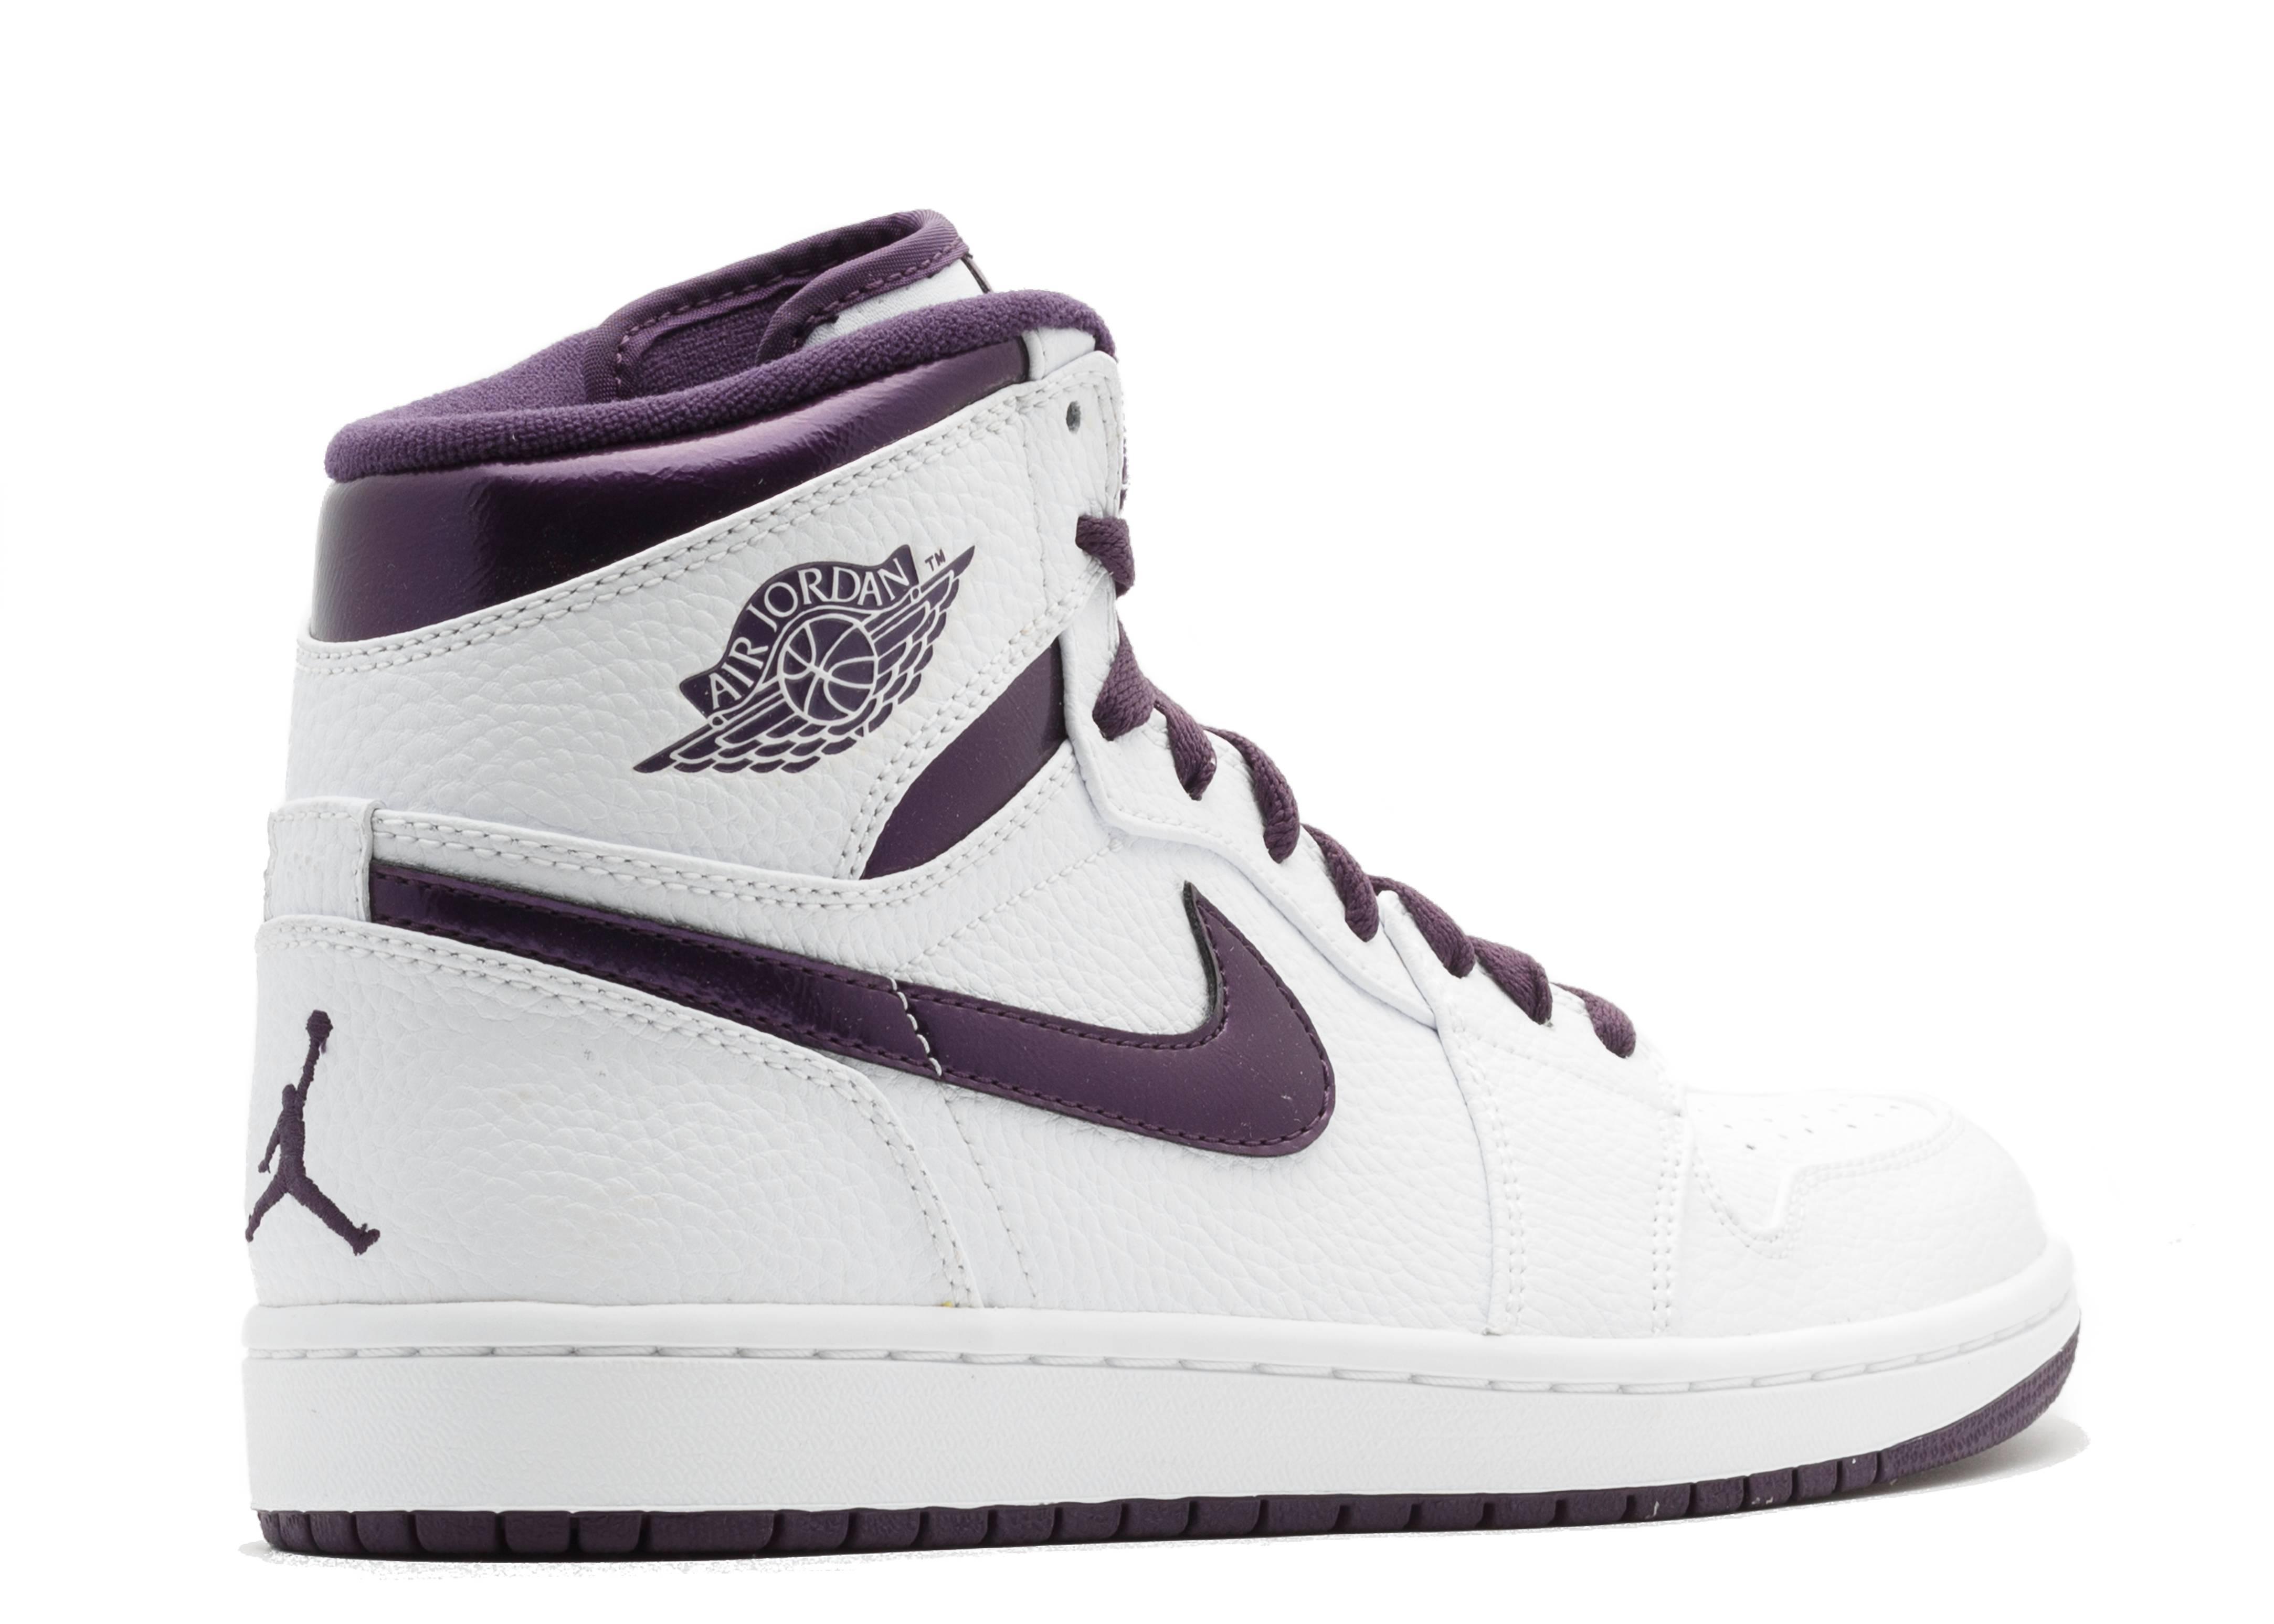 Air Jordan 1 Retro High - Air Jordan - 332550 151 - white grand ... c00b0d460